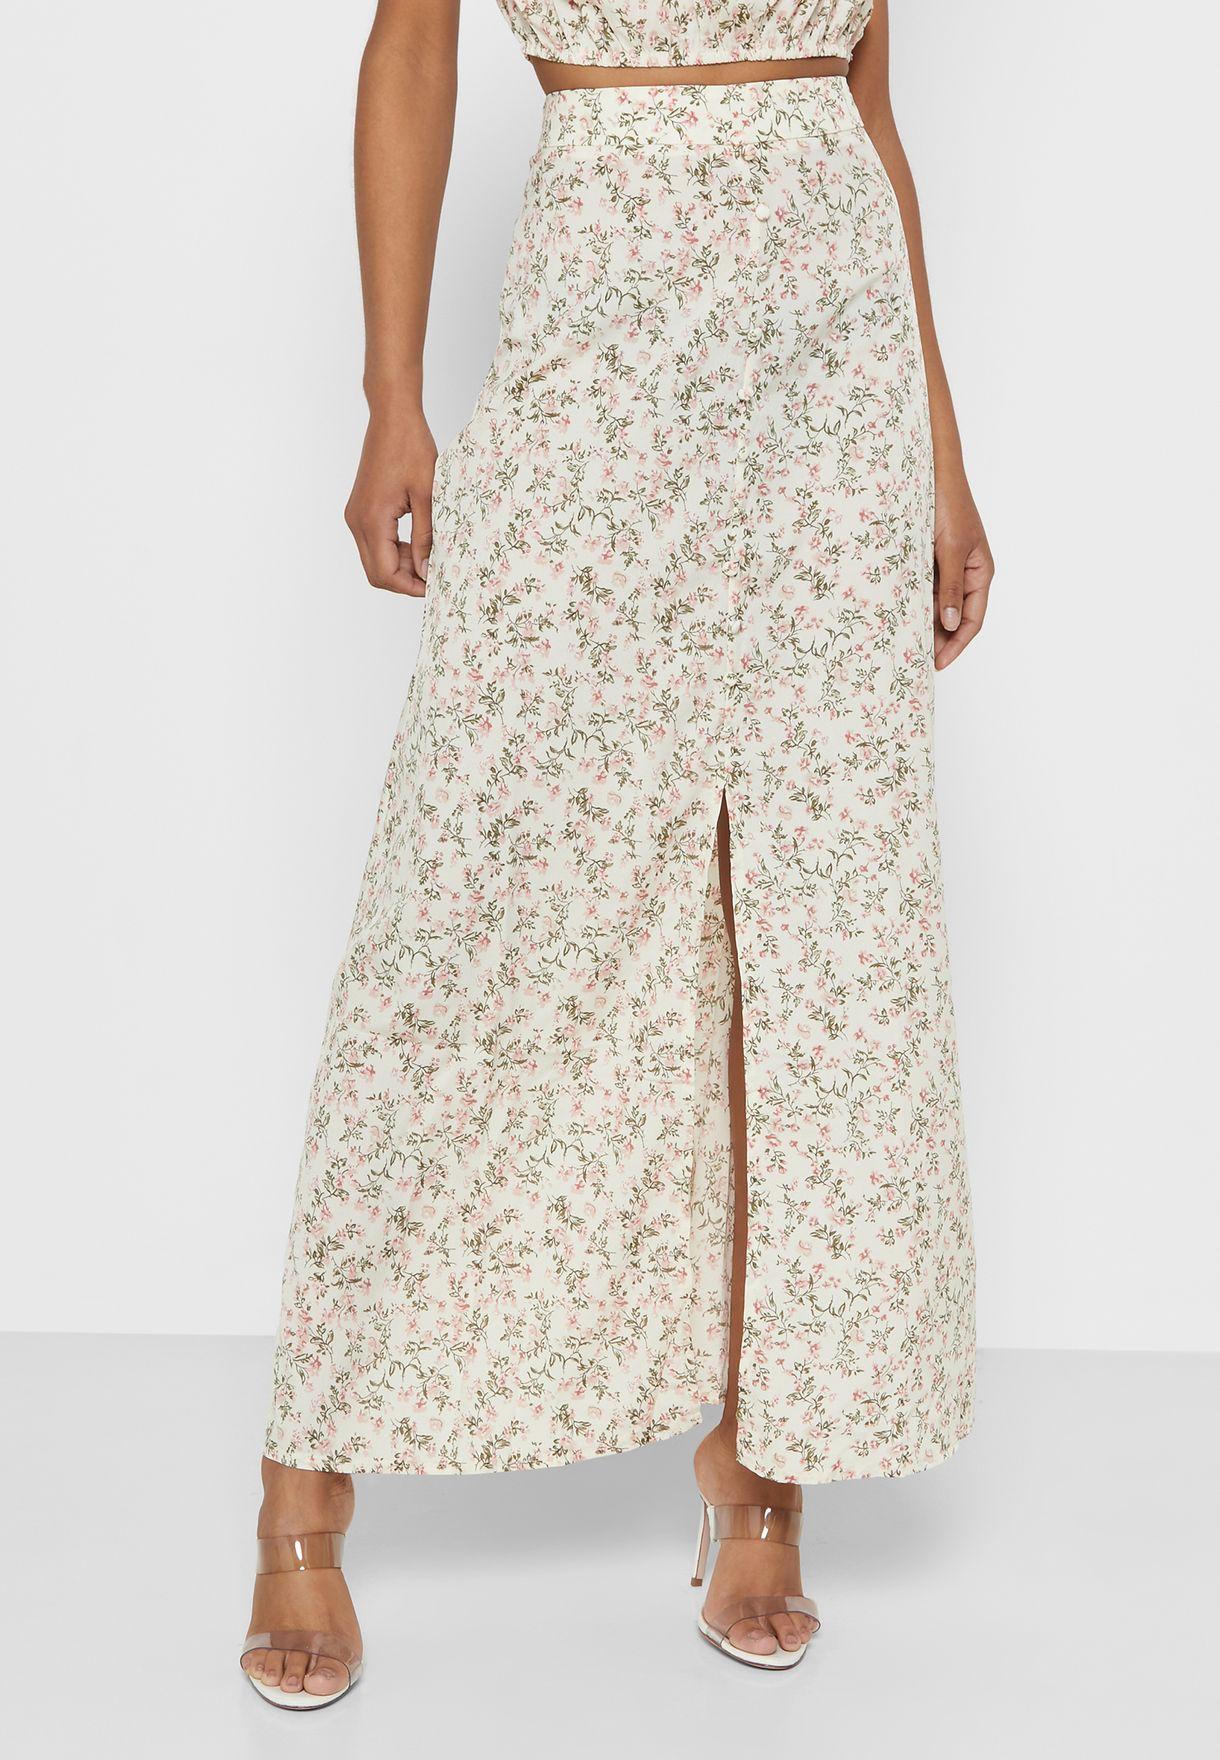 Floral Print Bardot Maxi Skirt Set